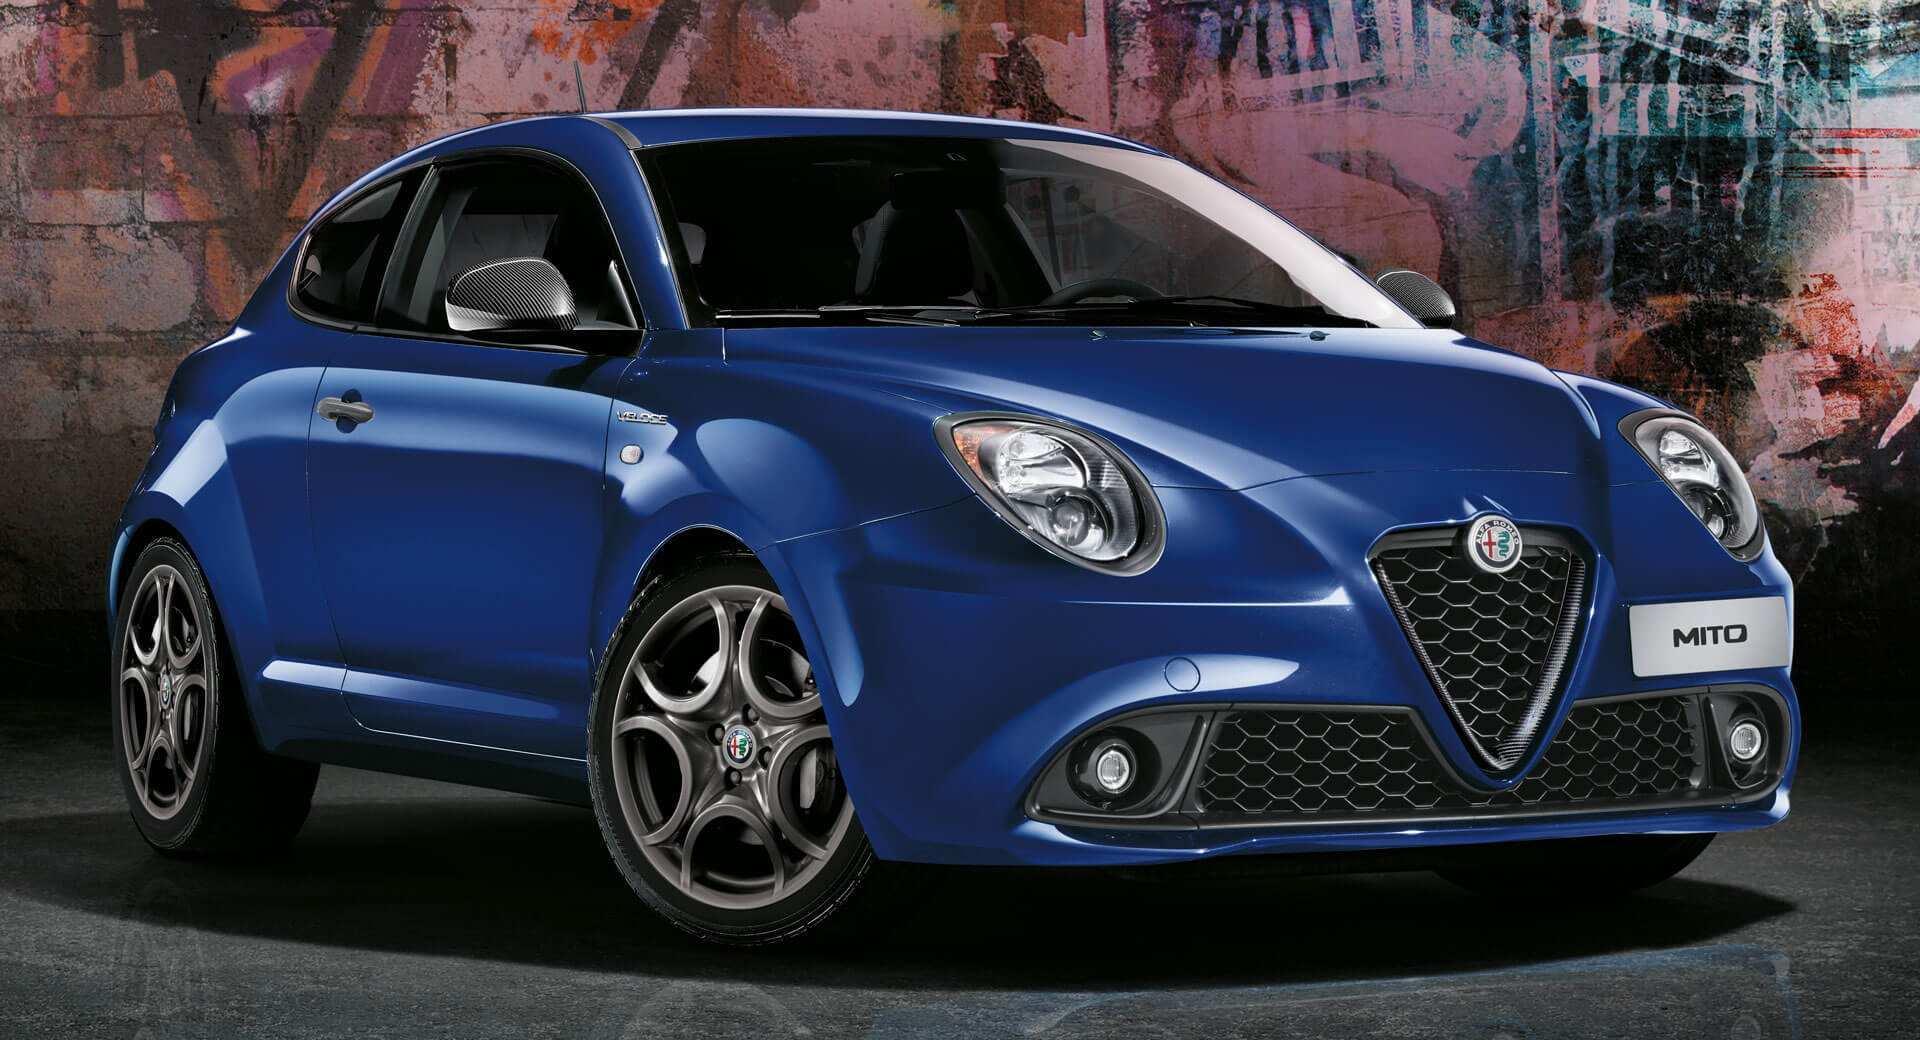 12 New Alfa Mito 2020 Price and Review with Alfa Mito 2020